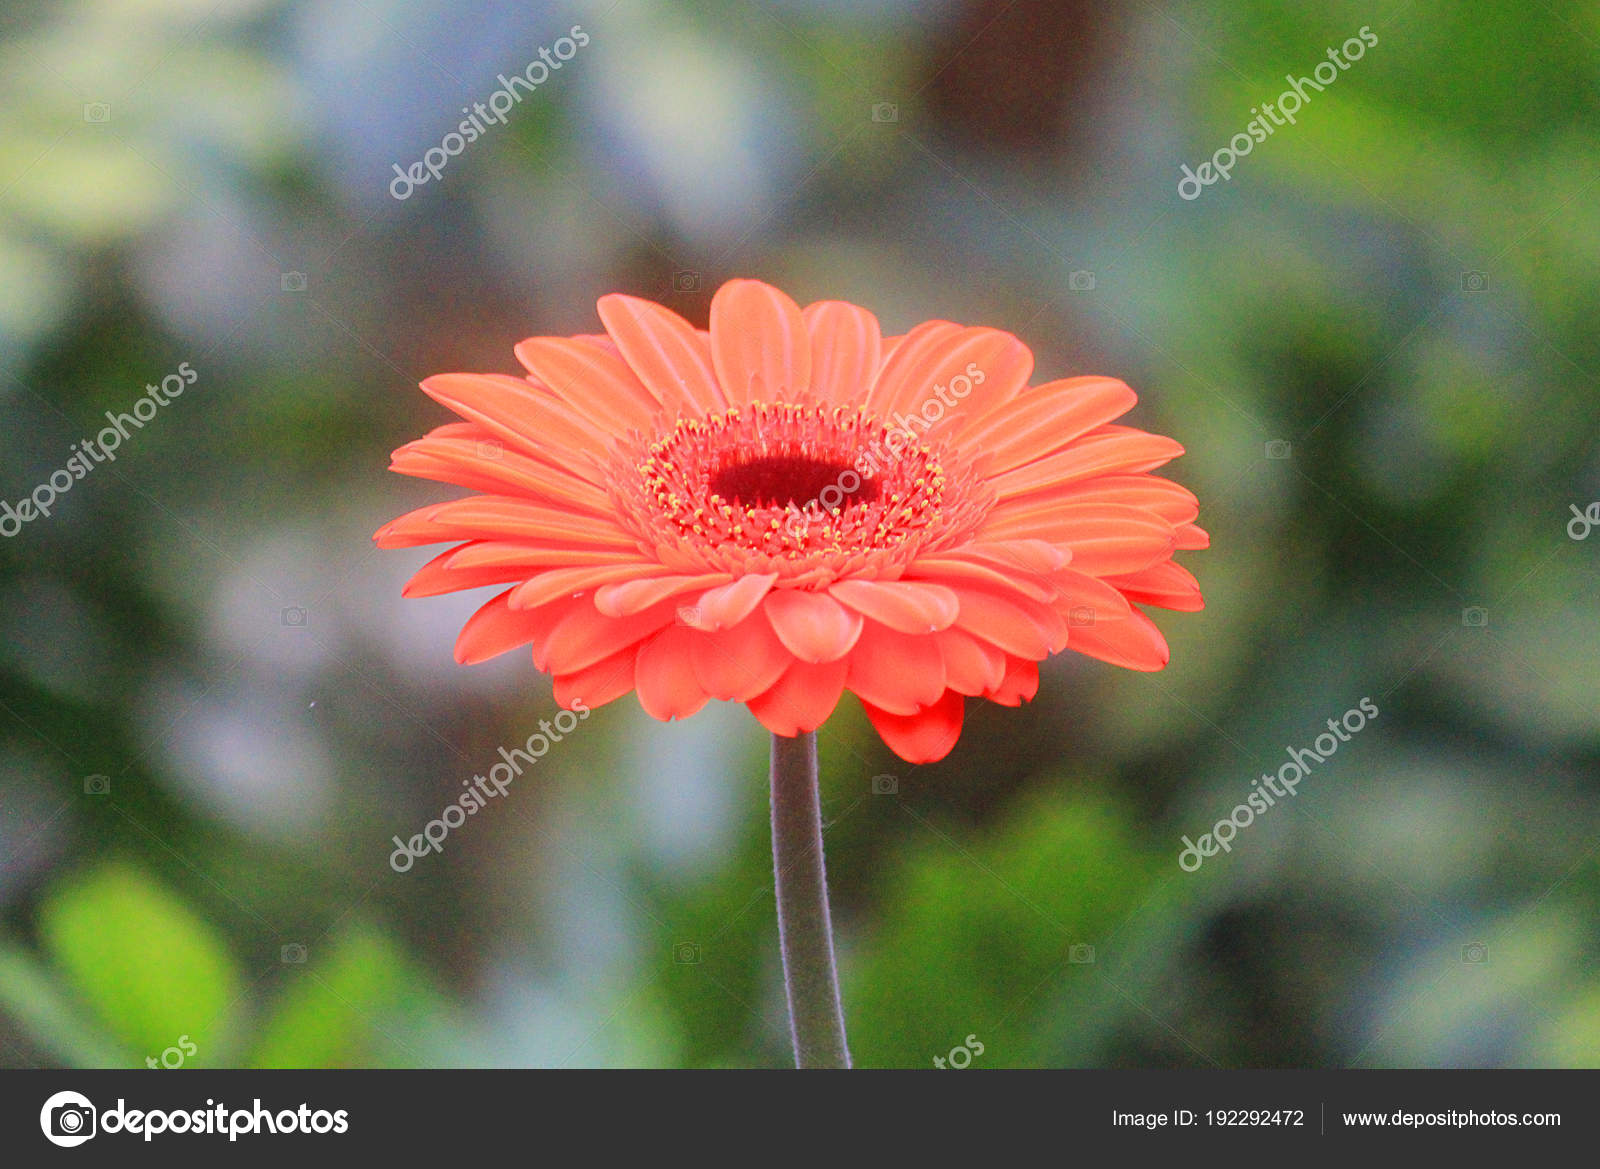 Gerbera Flower In Spring Season Stock Photo Piknik67 192292472